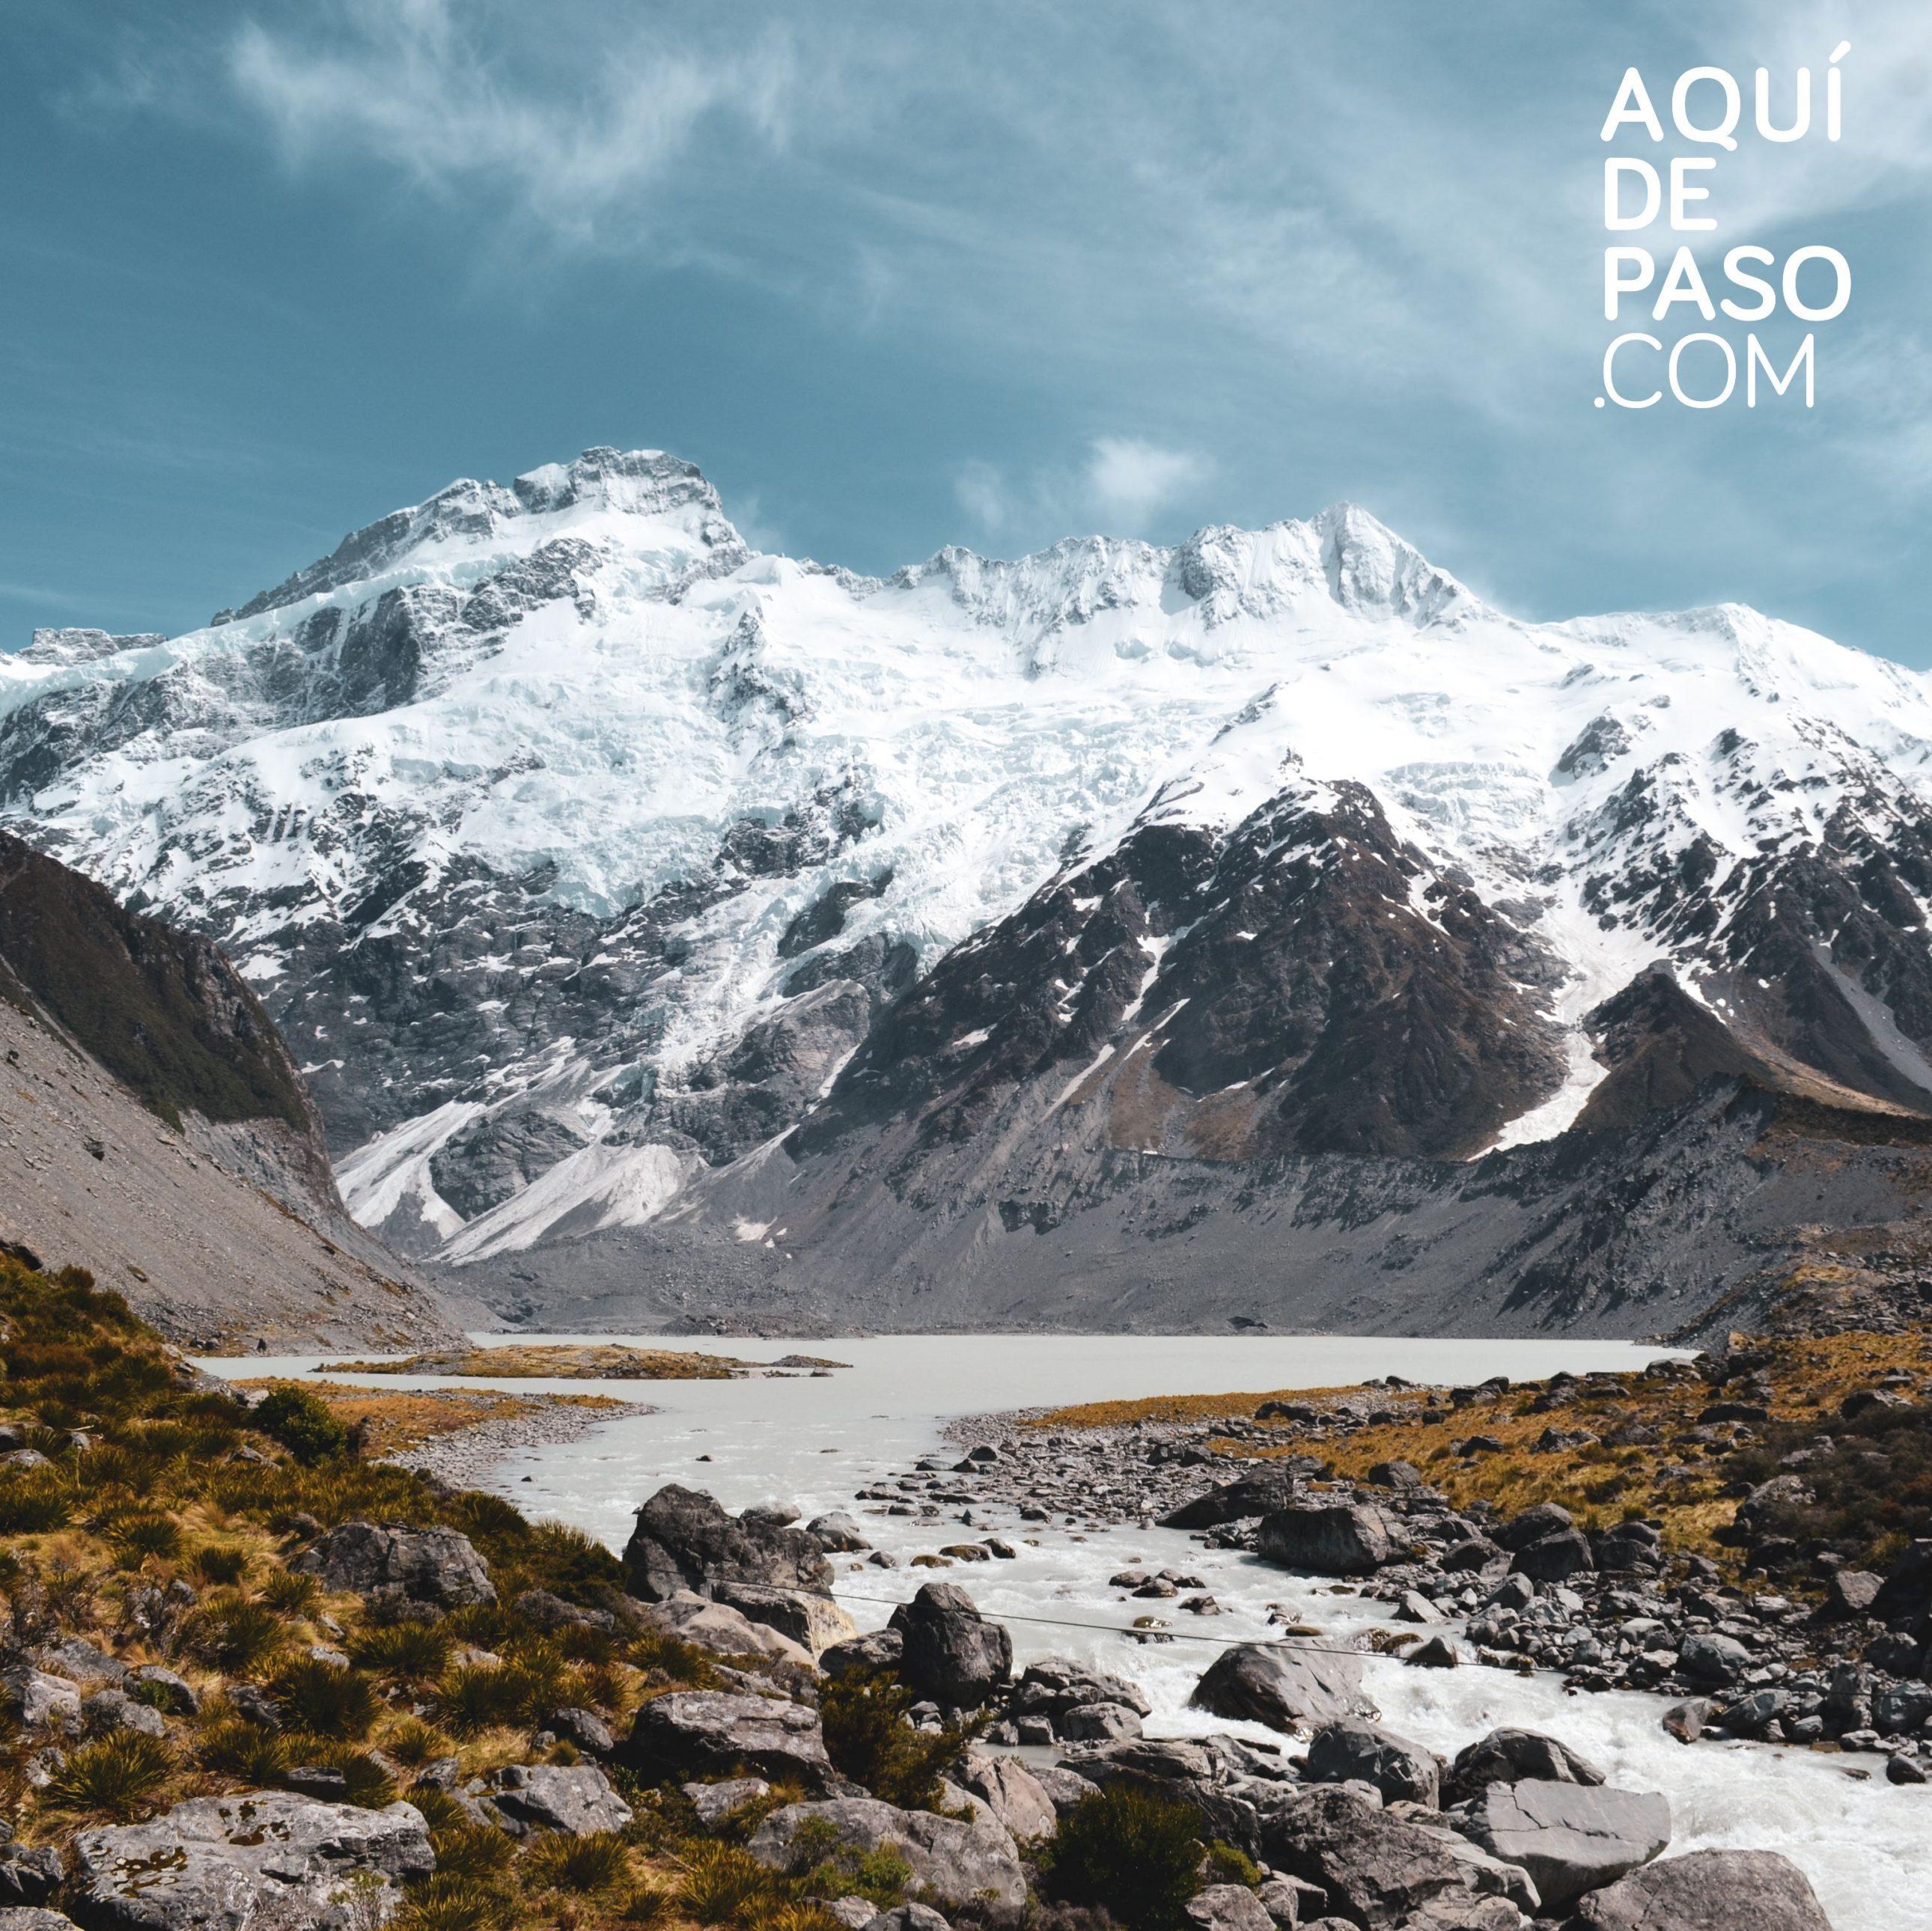 Imperdibles Nueva Zelanda MOUNT COOK - AQUIDEPASO.COM